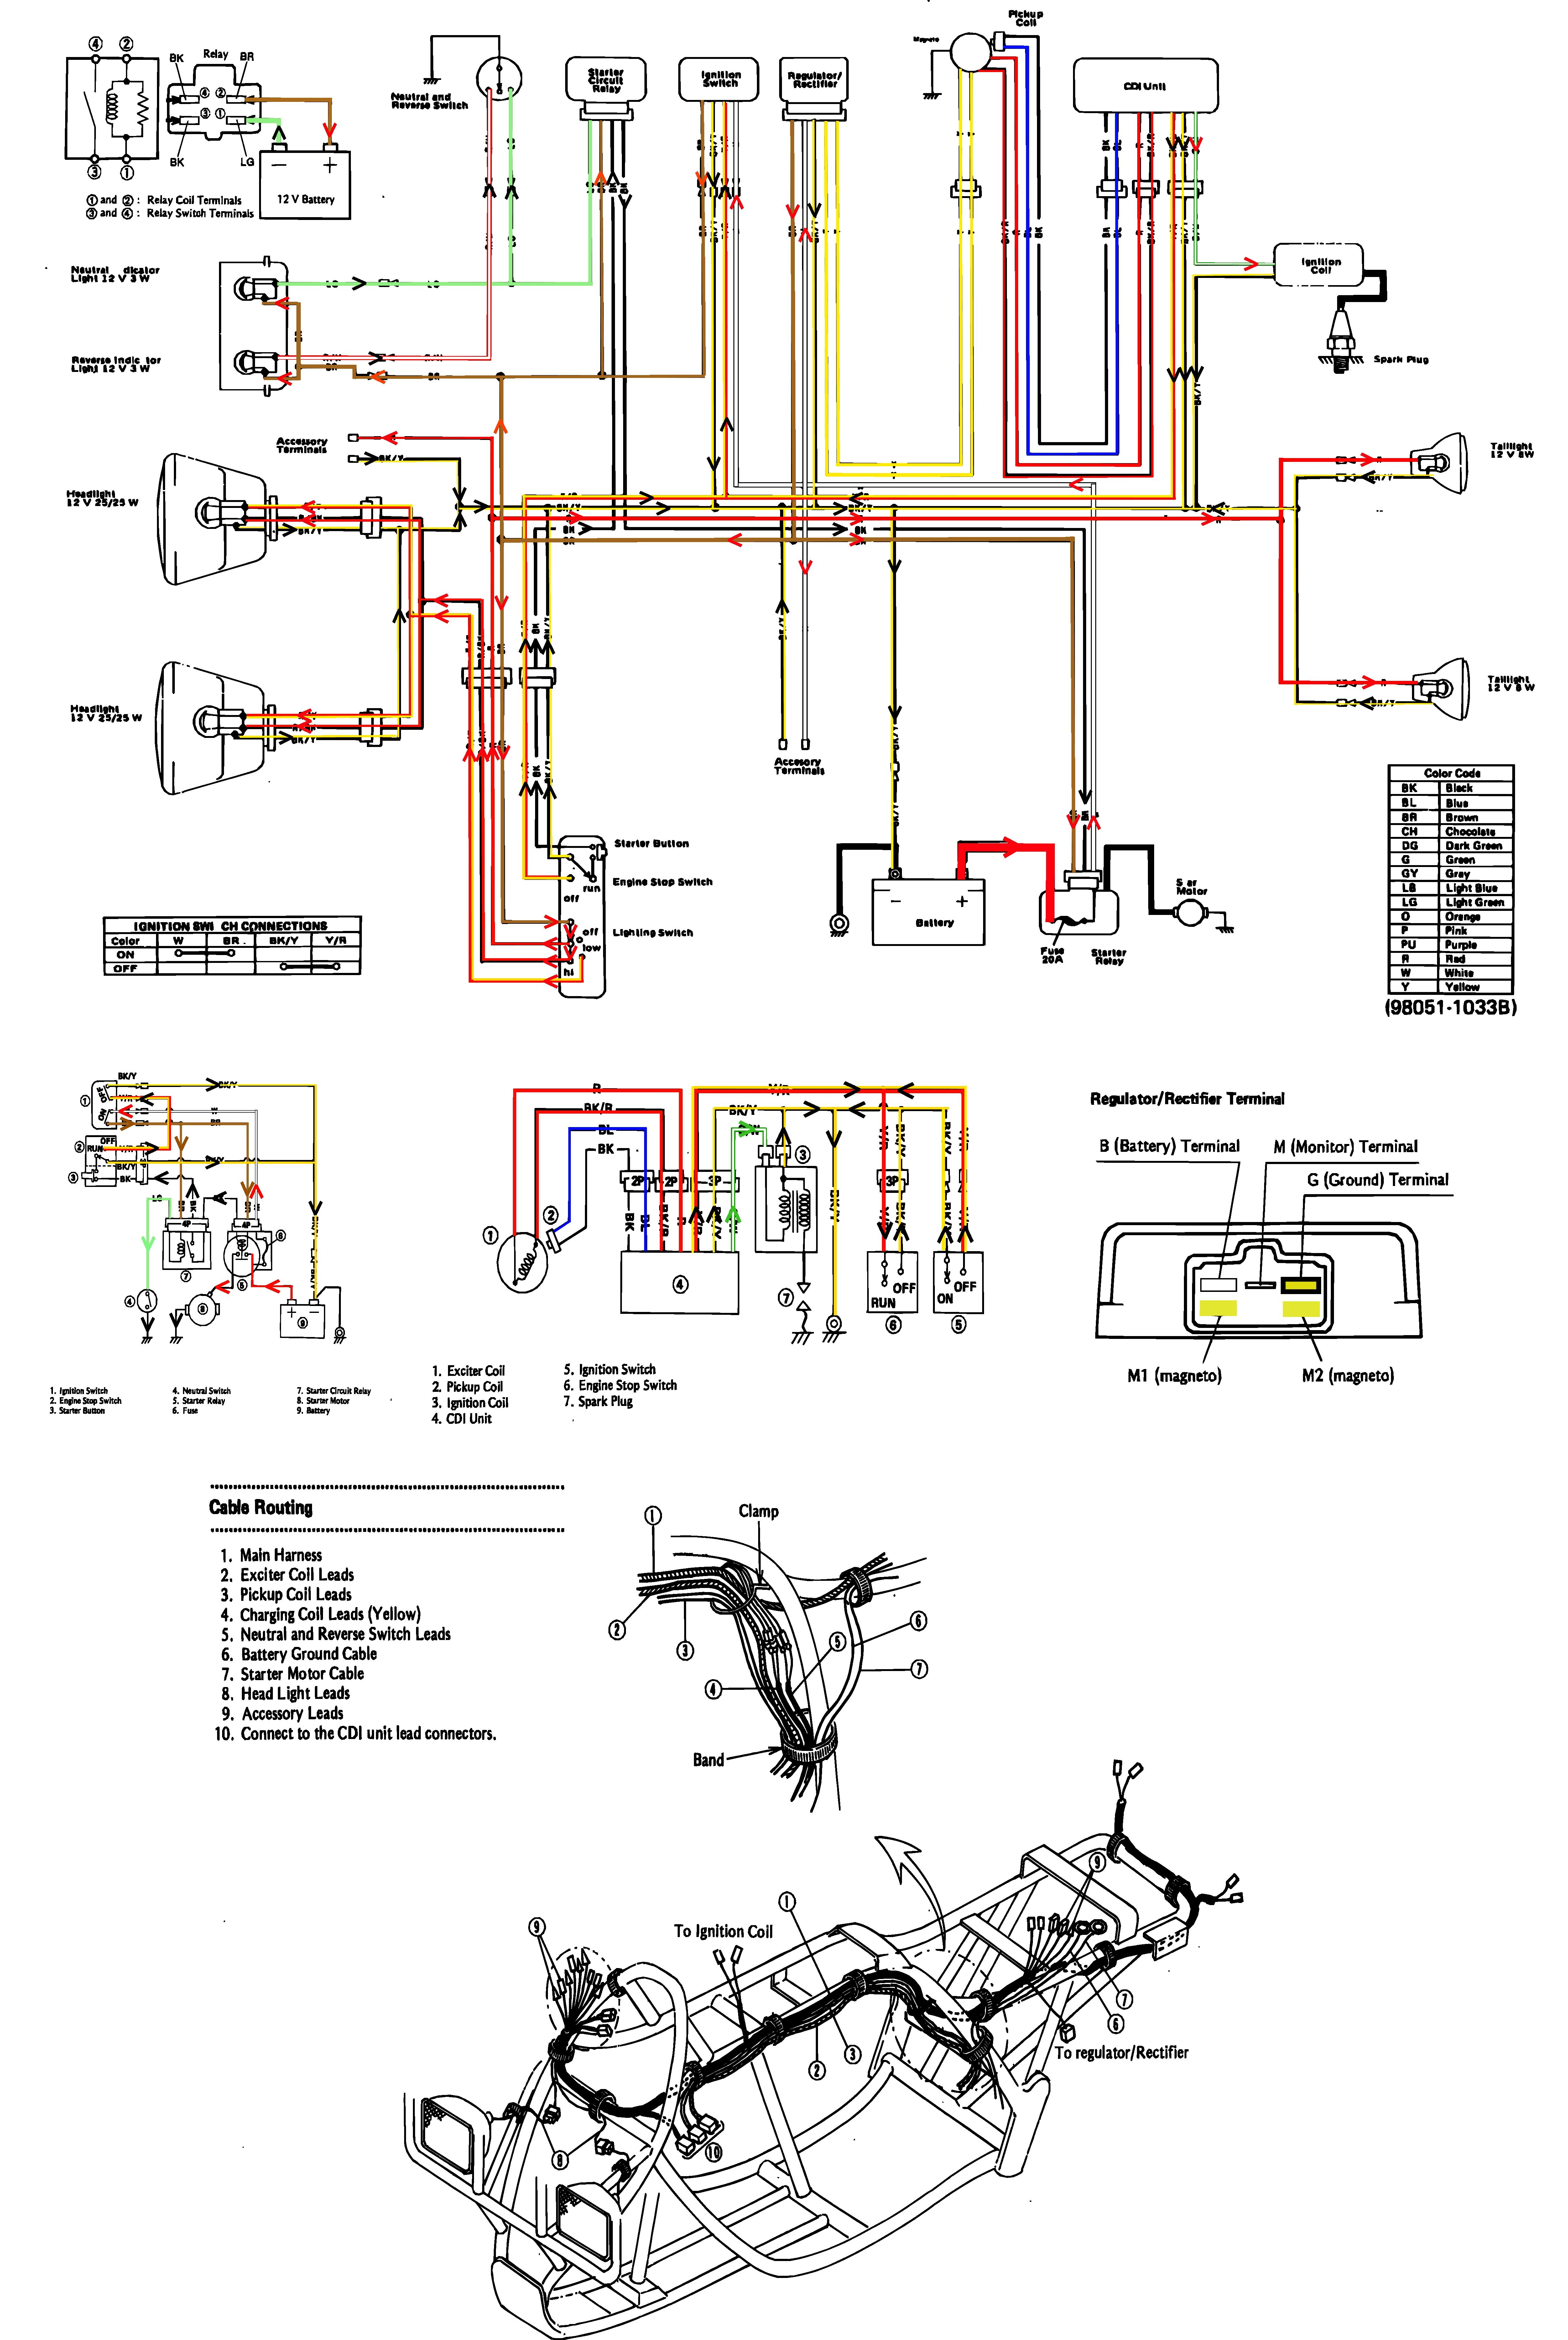 Kawasaki 1988 Klf220 A1 Bayou Wiring Diagram Electrical Wiring Diagram Motorcycle Wiring Electrical Wiring